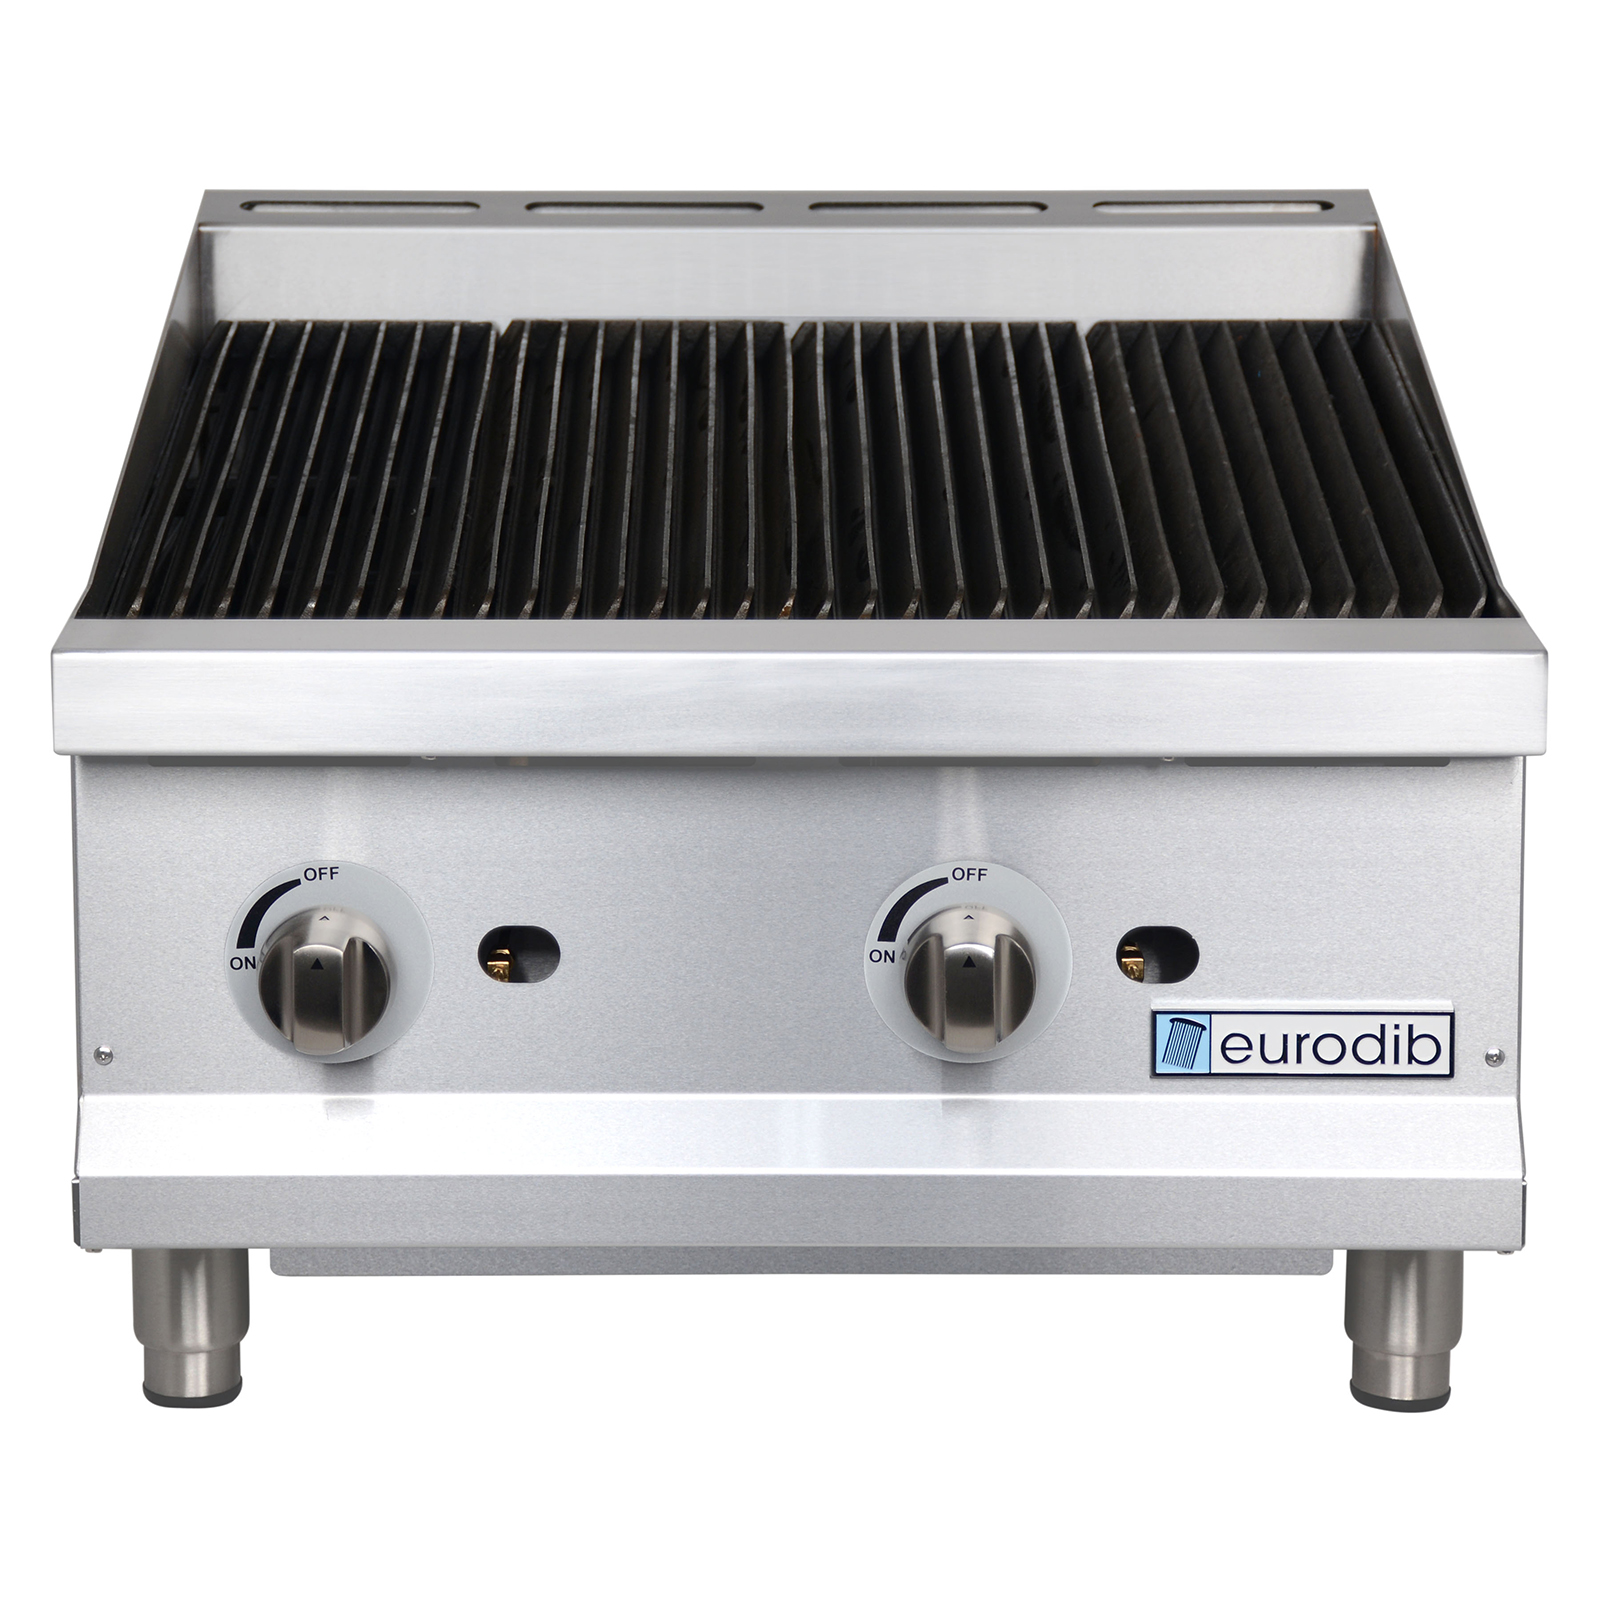 Eurodib USA T-CBR24 charbroiler, gas, countertop